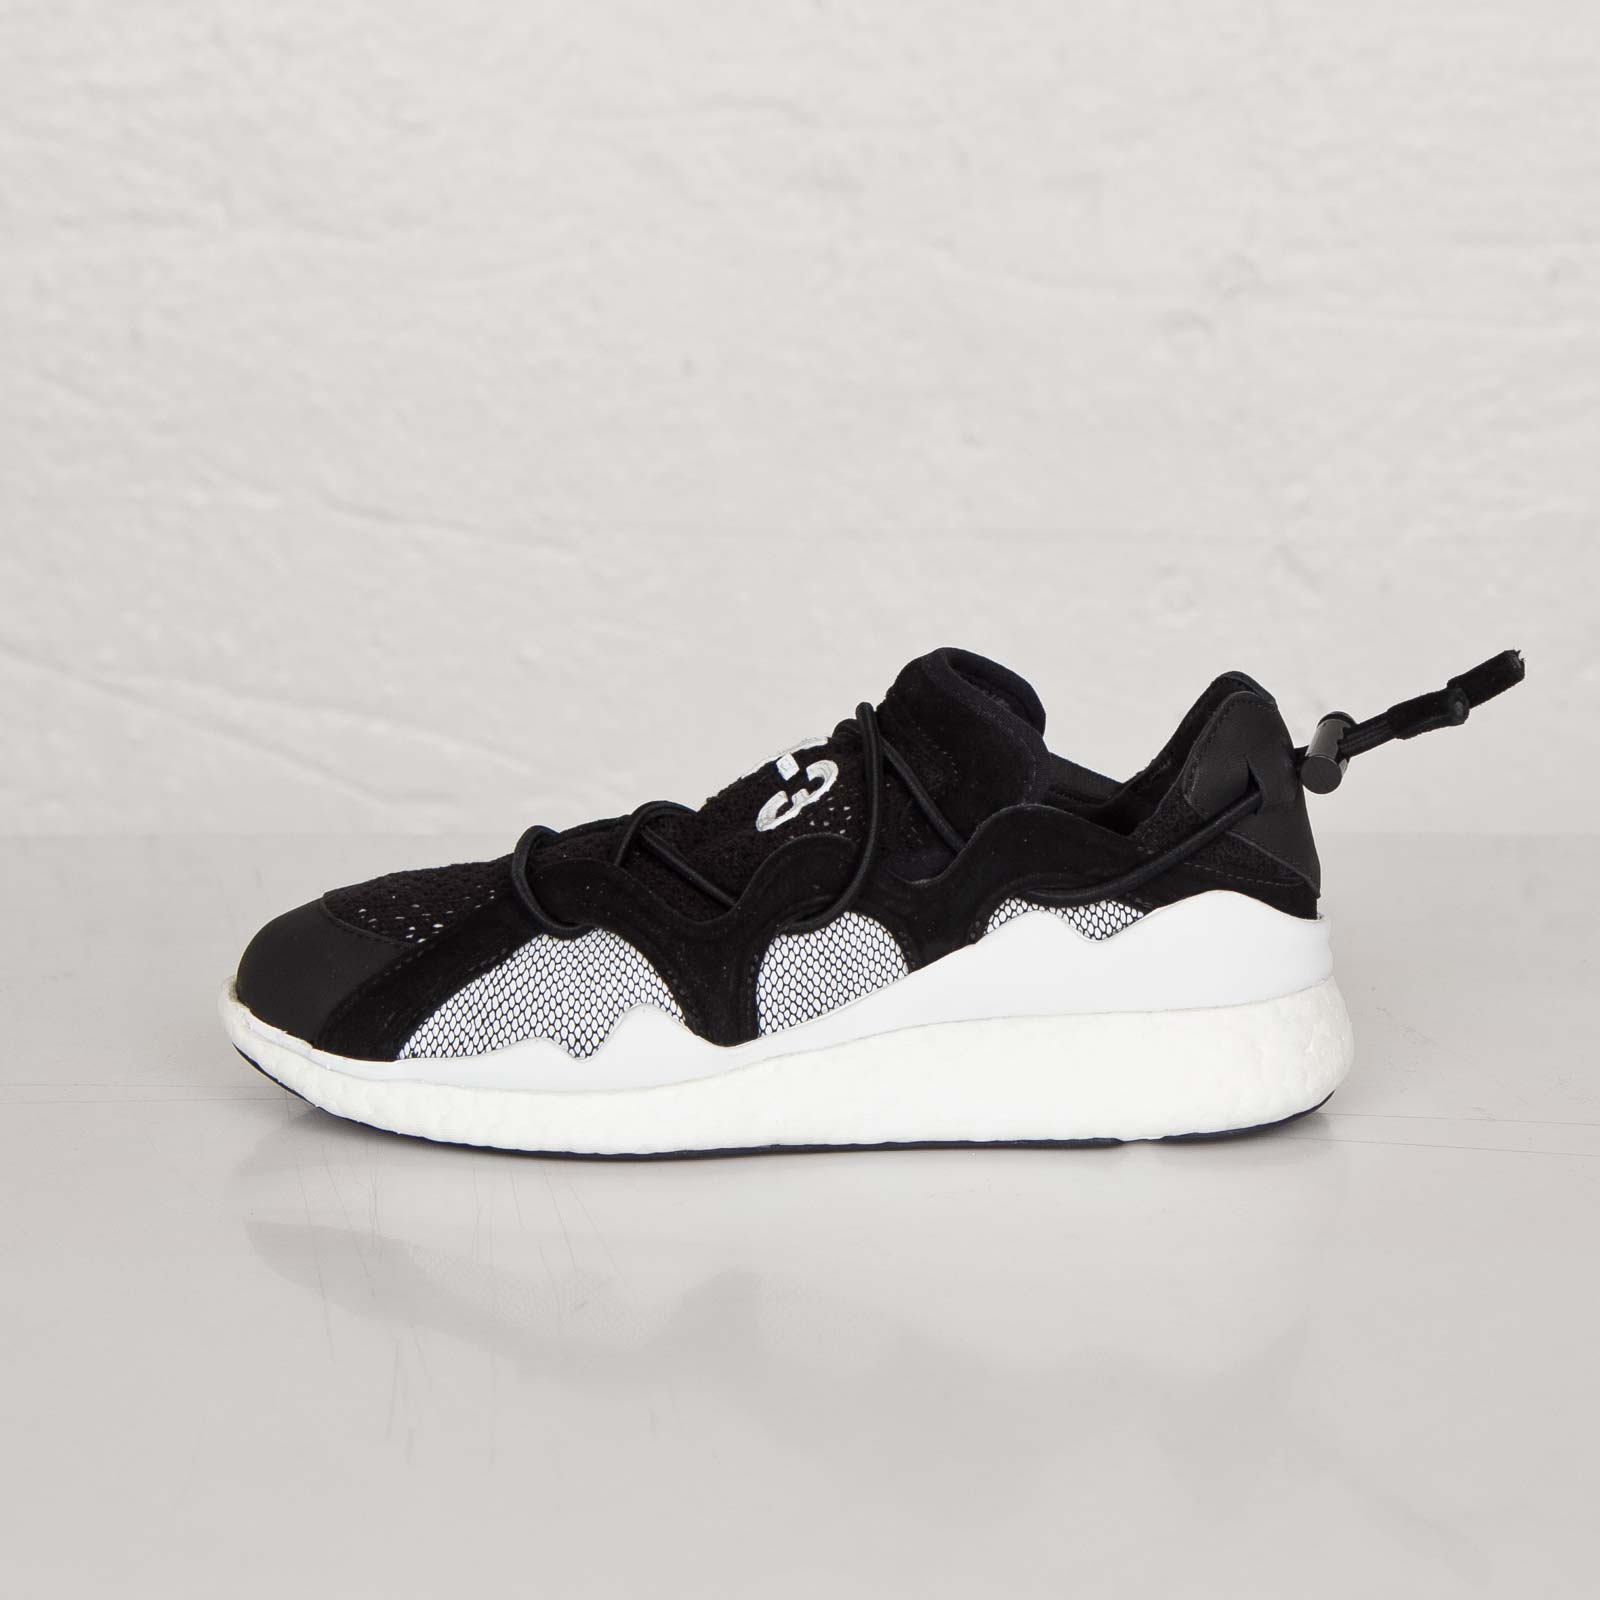 1de481e6edbf1 adidas Y-3 Toggle Boost - B26334 - Sneakersnstuff